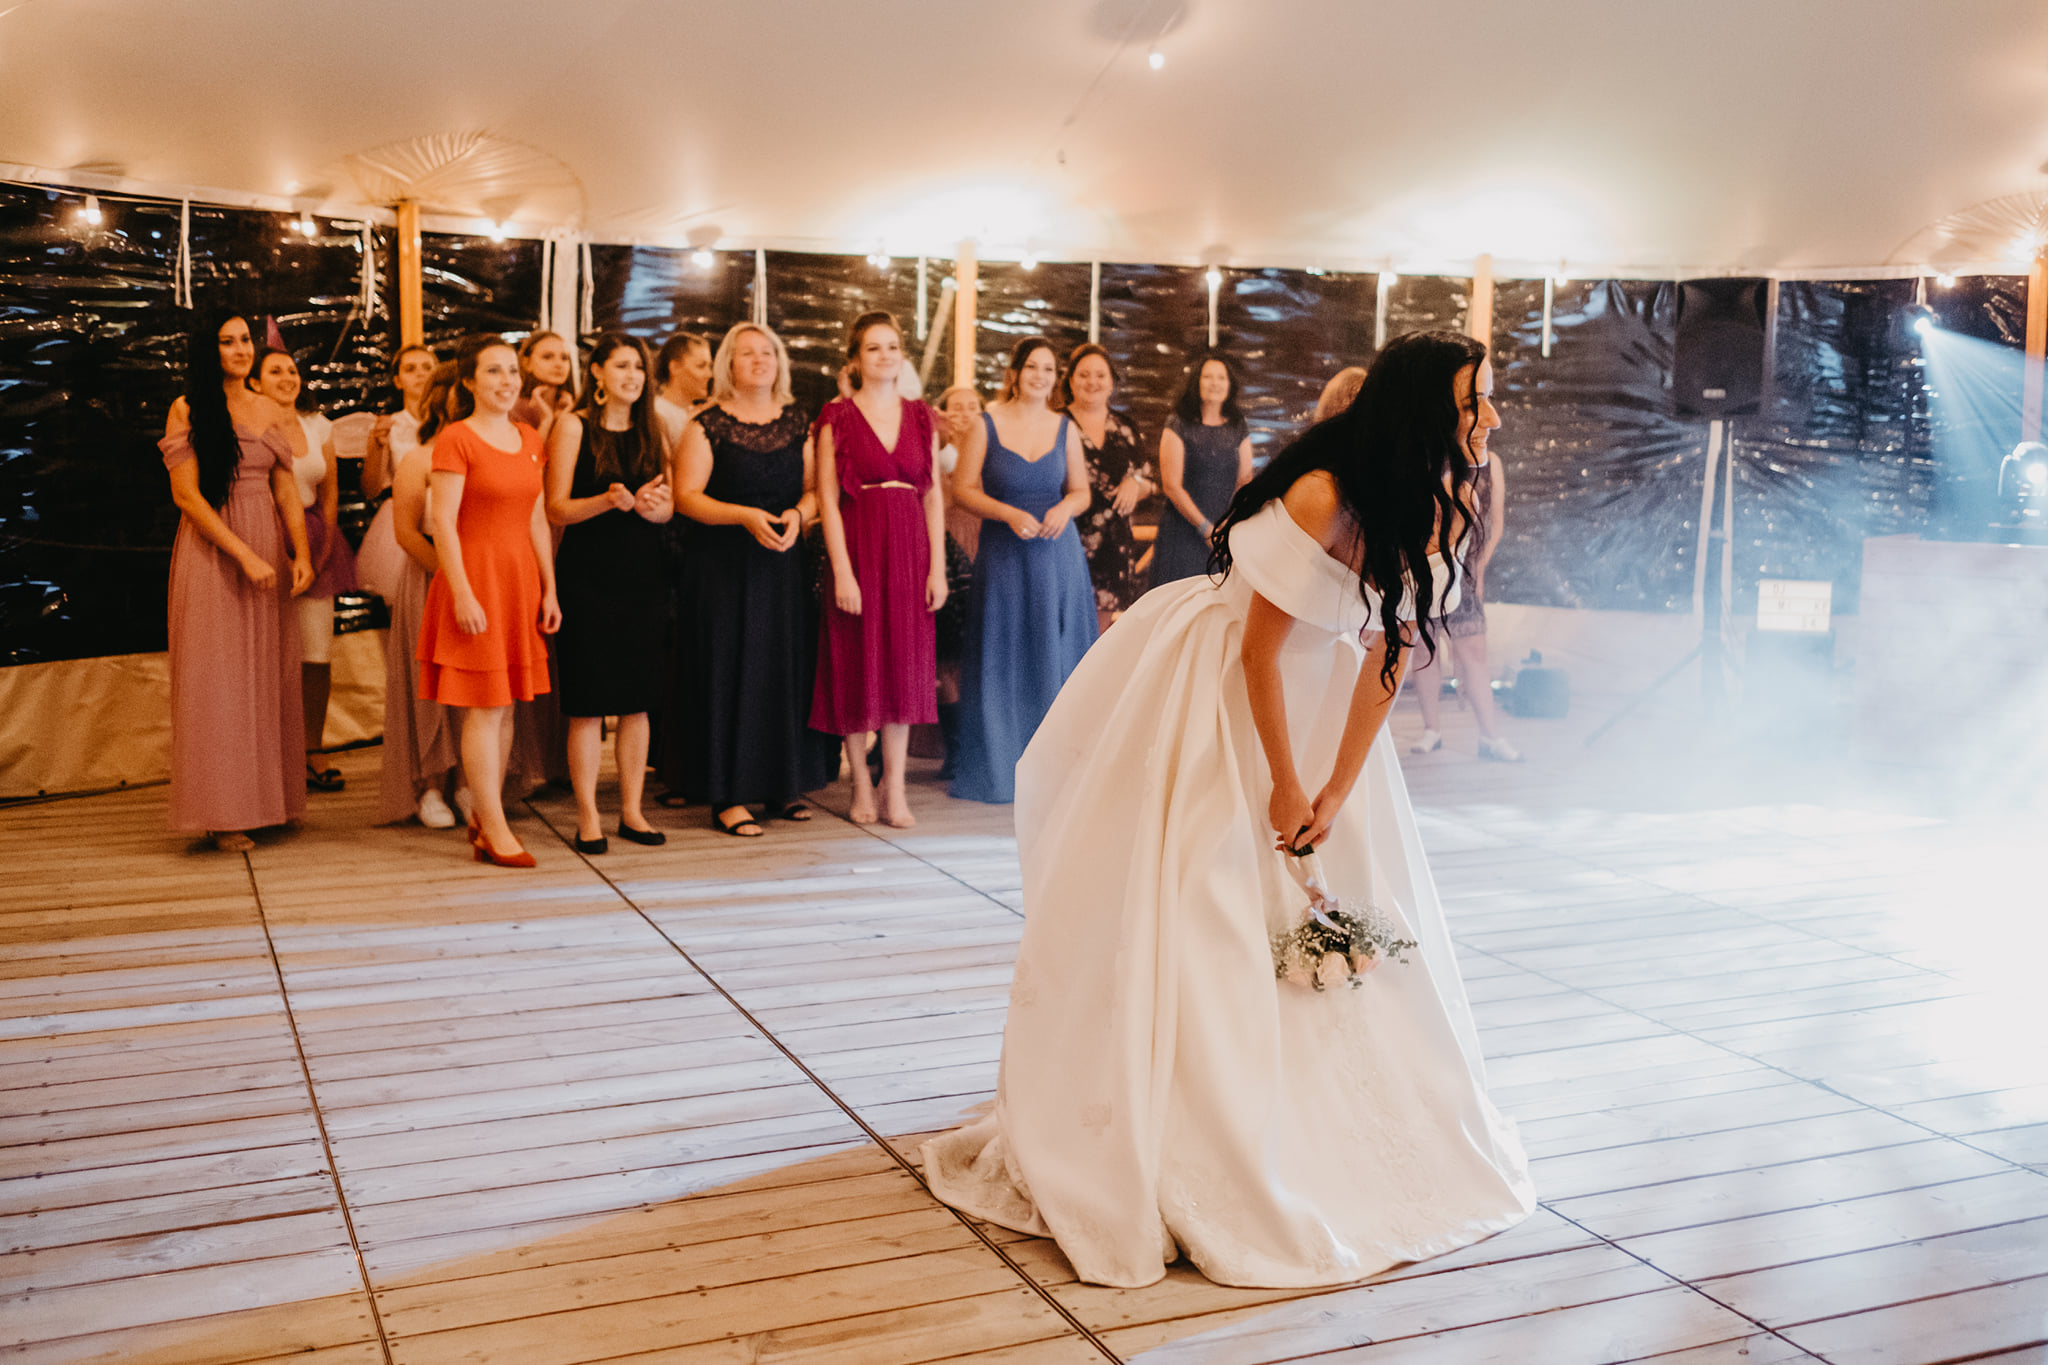 hadzanie-kytice-svadbajpg